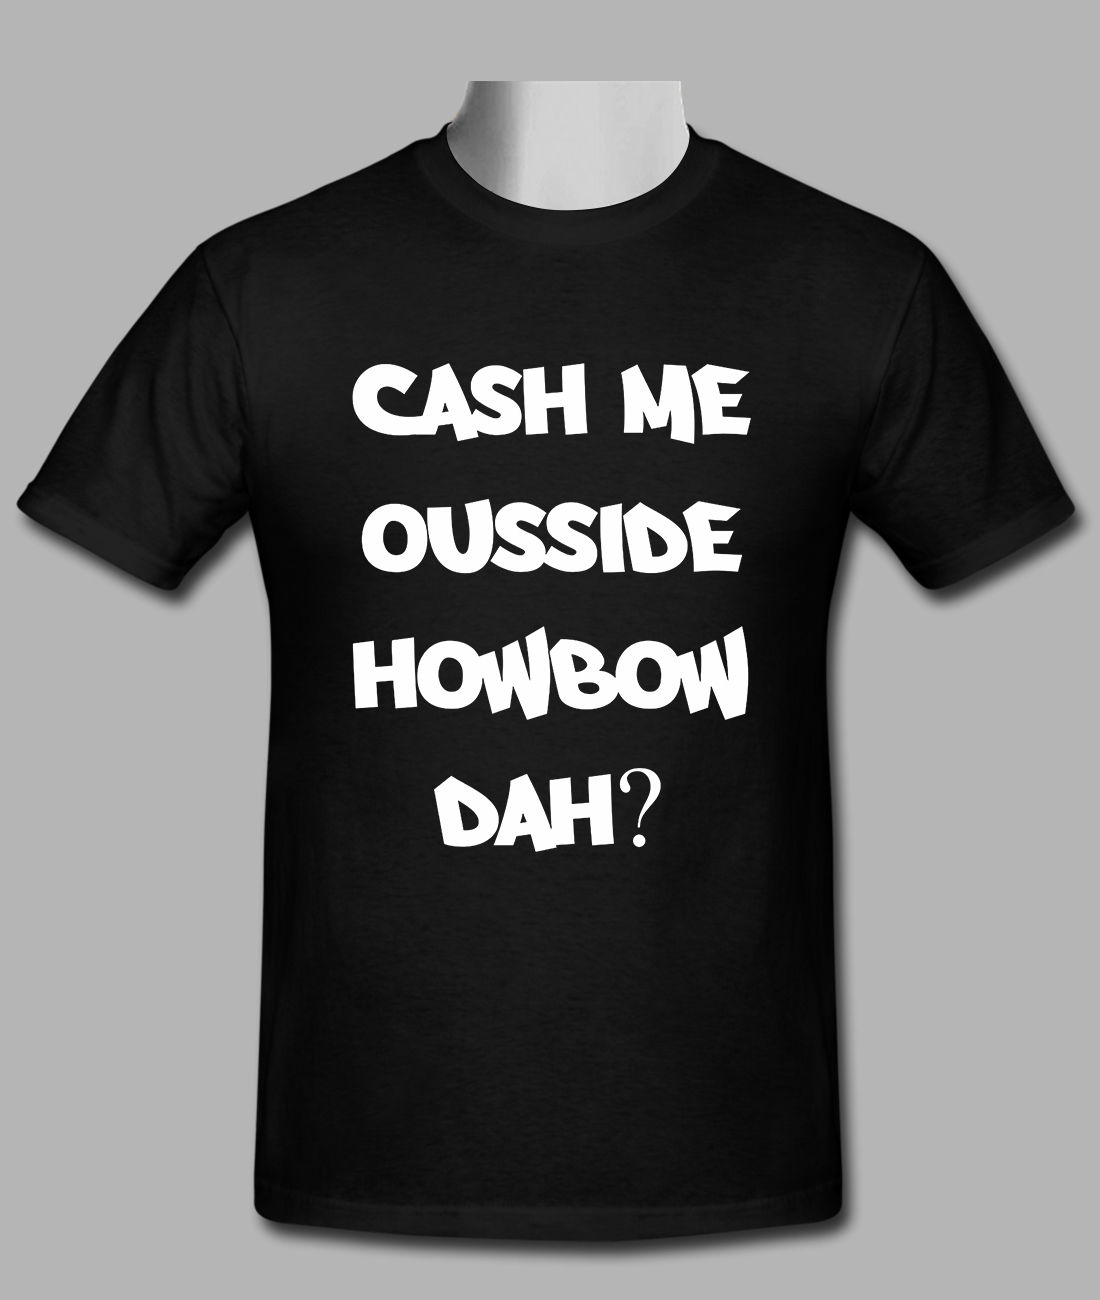 Shirt design gildan - T Shirt For Mens Online Cash Me Ousside Howbow Dah Custom Gildan 2017 Fashion Short Sleeve